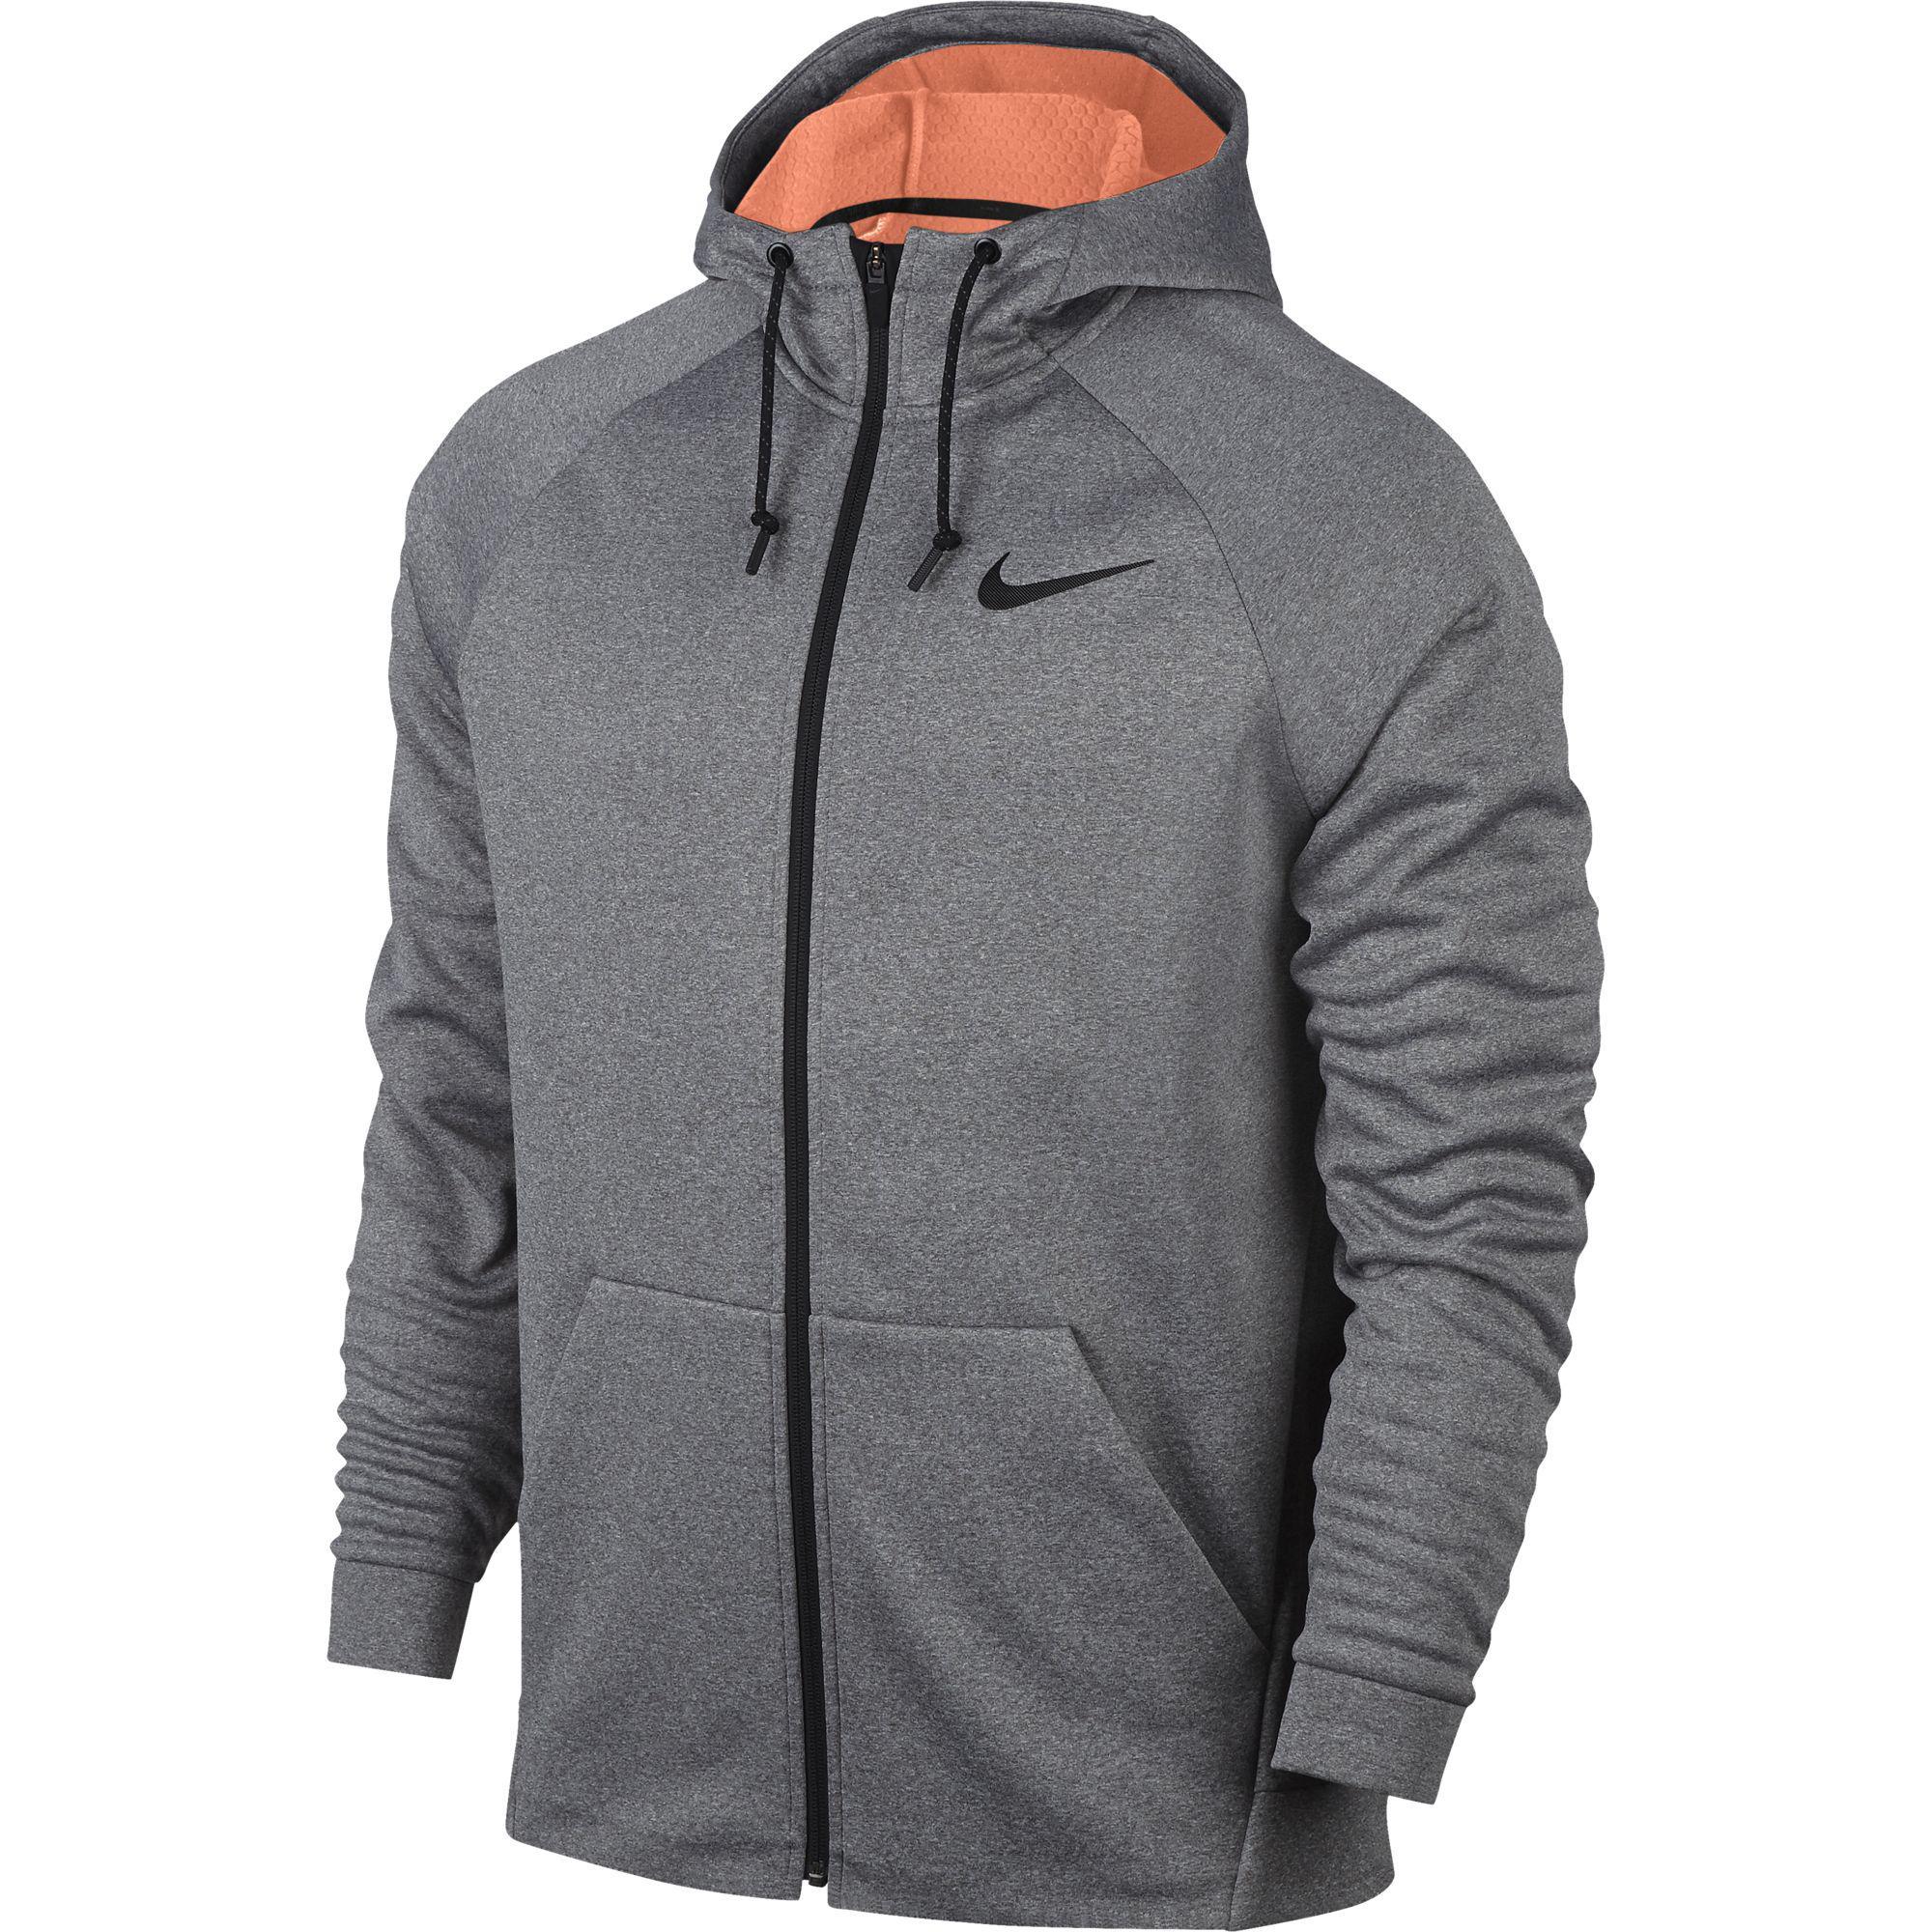 5f5b9cdafbbe Nike Mens Therma Sphere Training Jacket - Carbon Heather Hyper Crimson -  Tennisnuts.com